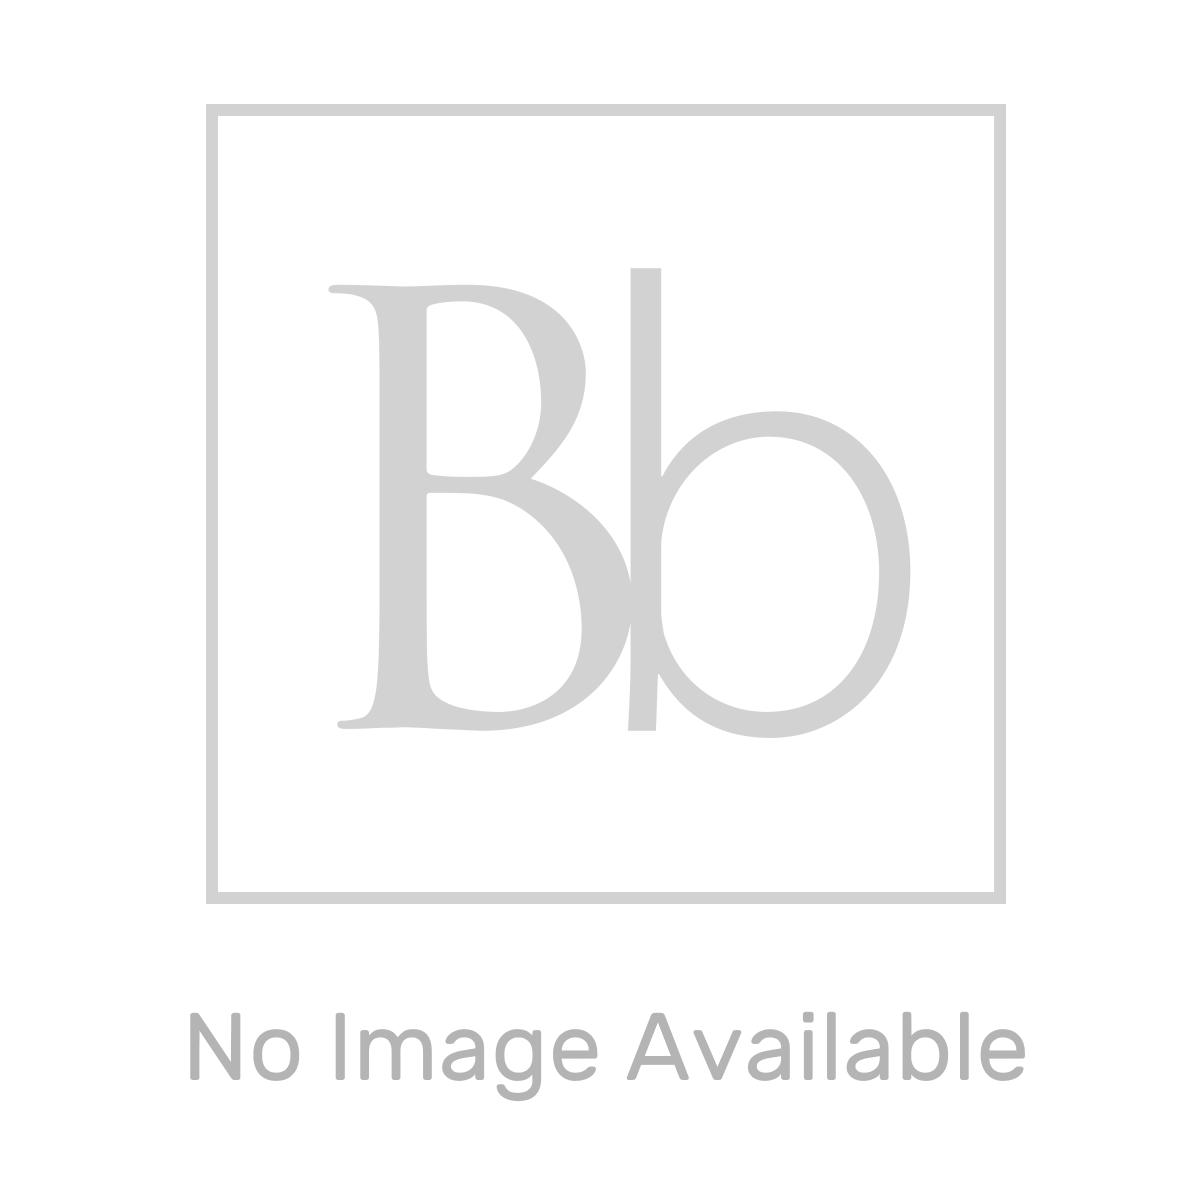 McAlpine White Plastic Mushroom Flange for 1½